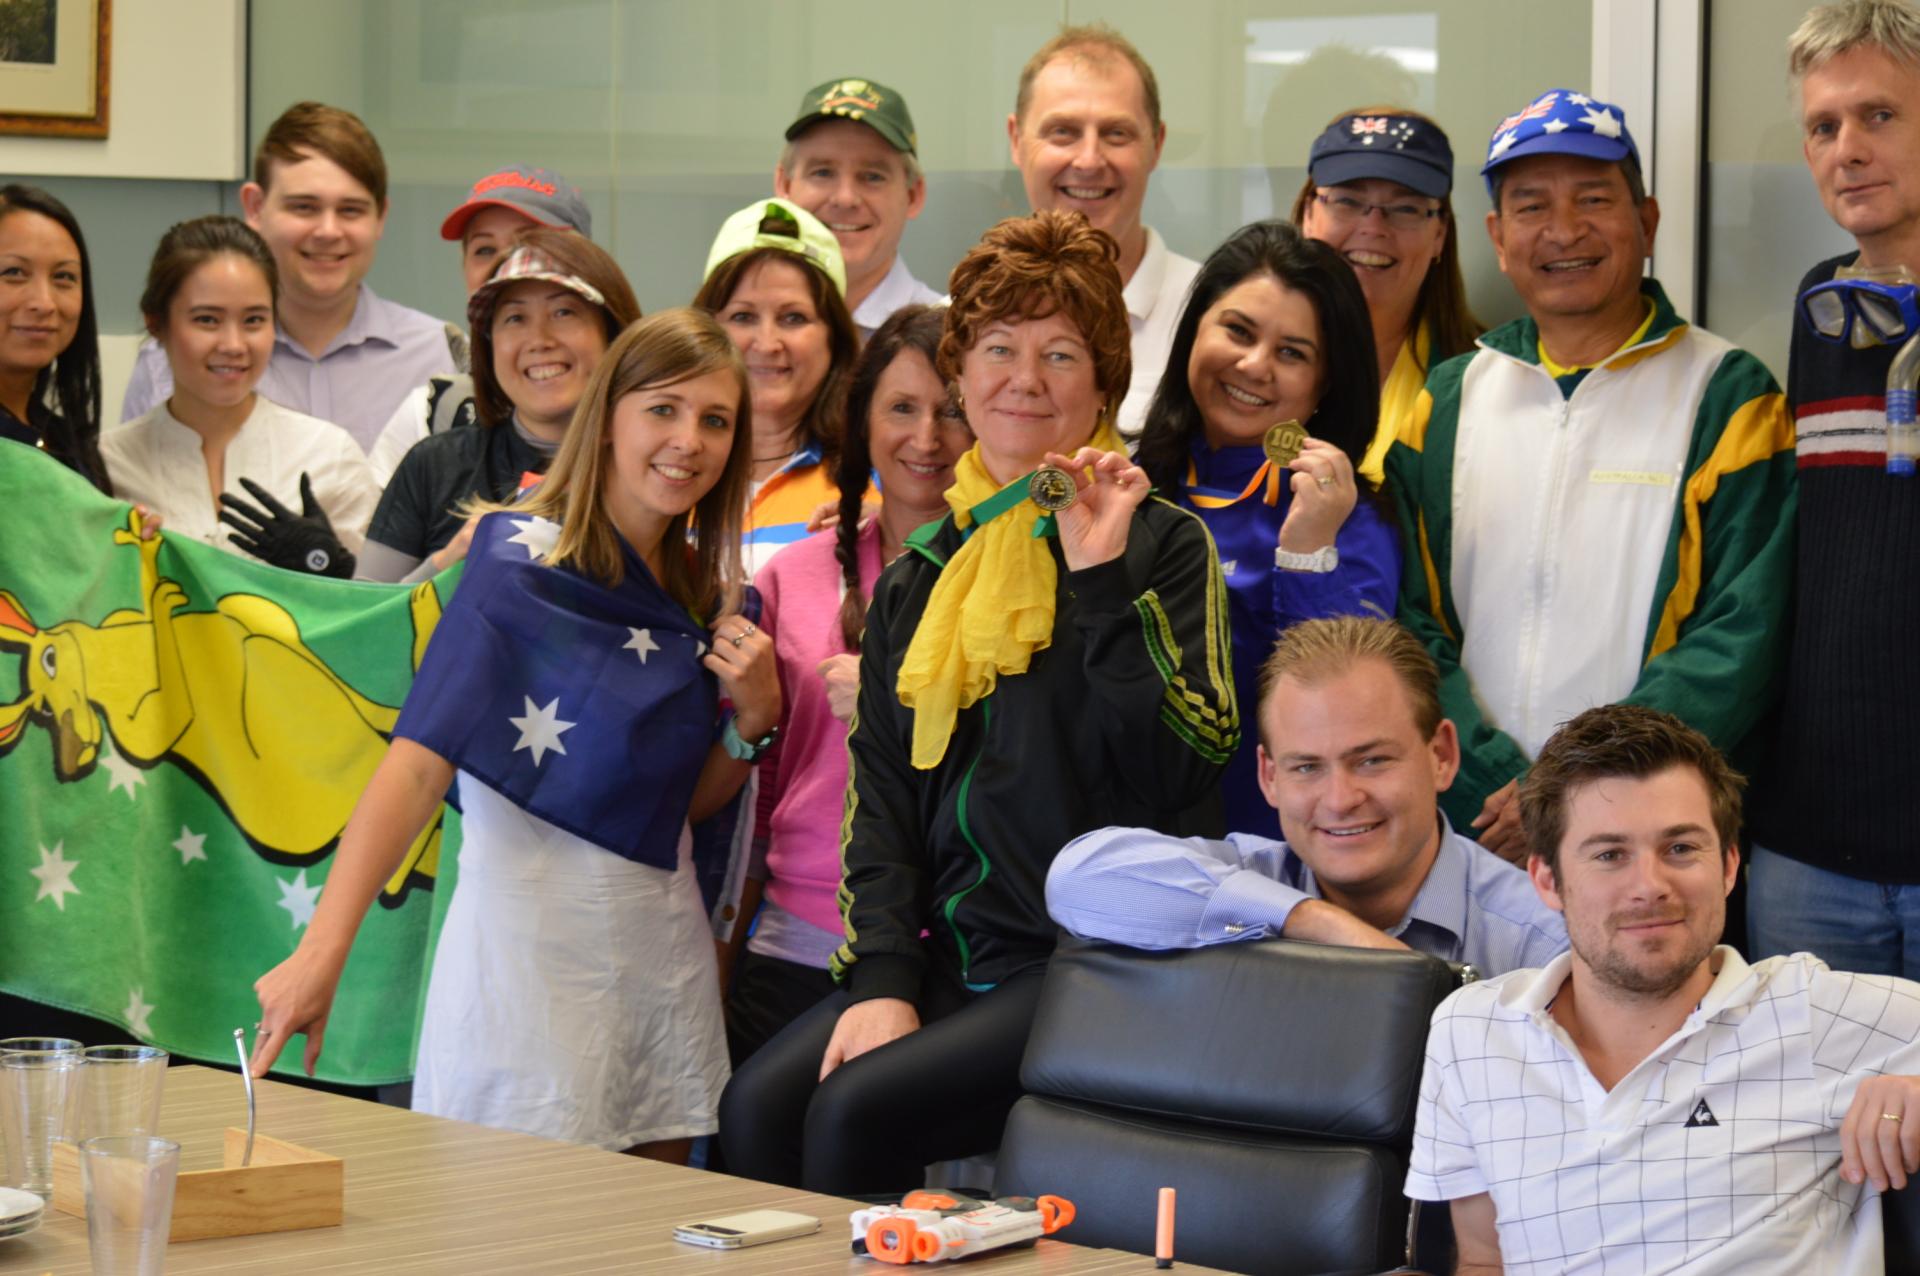 ROCG Perth - Office Olympics 2016